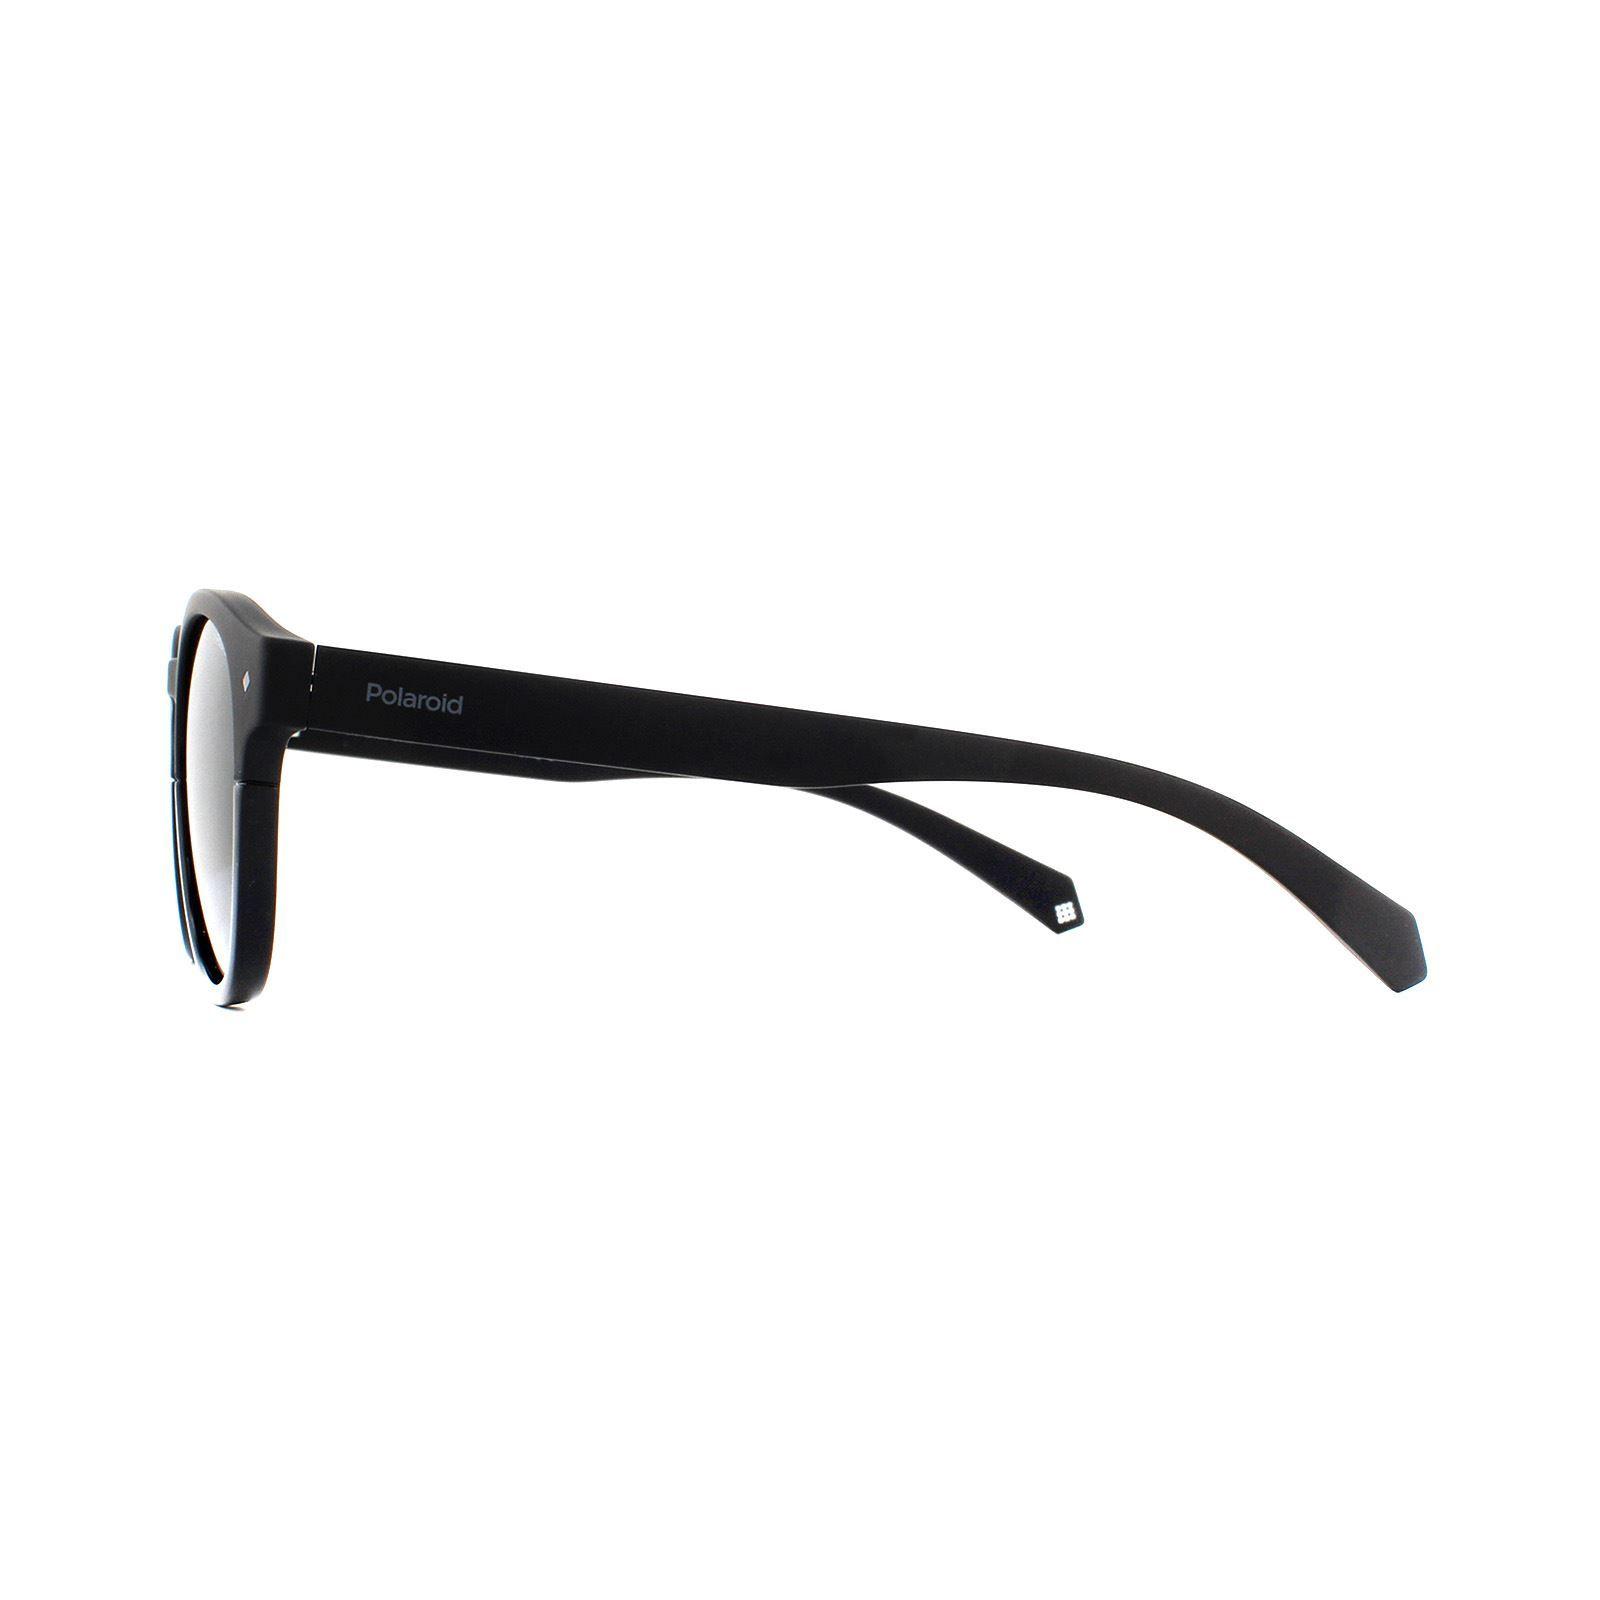 Polaroid Sunglasses 6042/S 807 M9 Black Grey Polarized